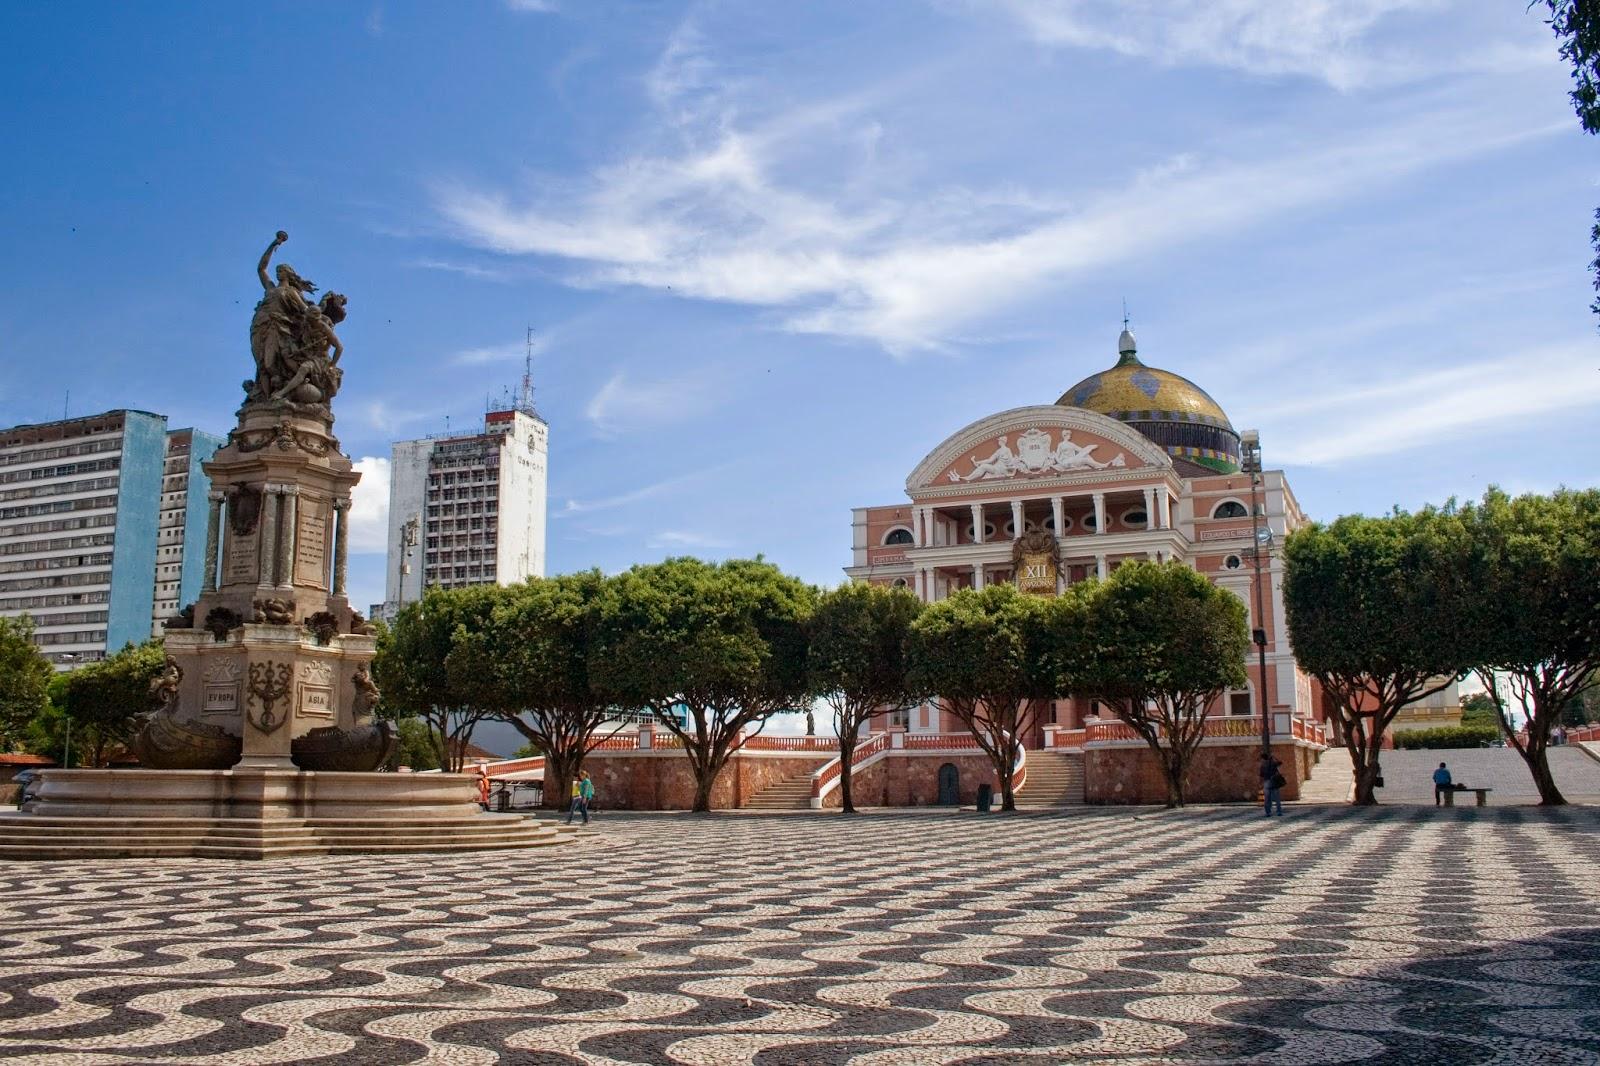 Manaus city centre, Brazil